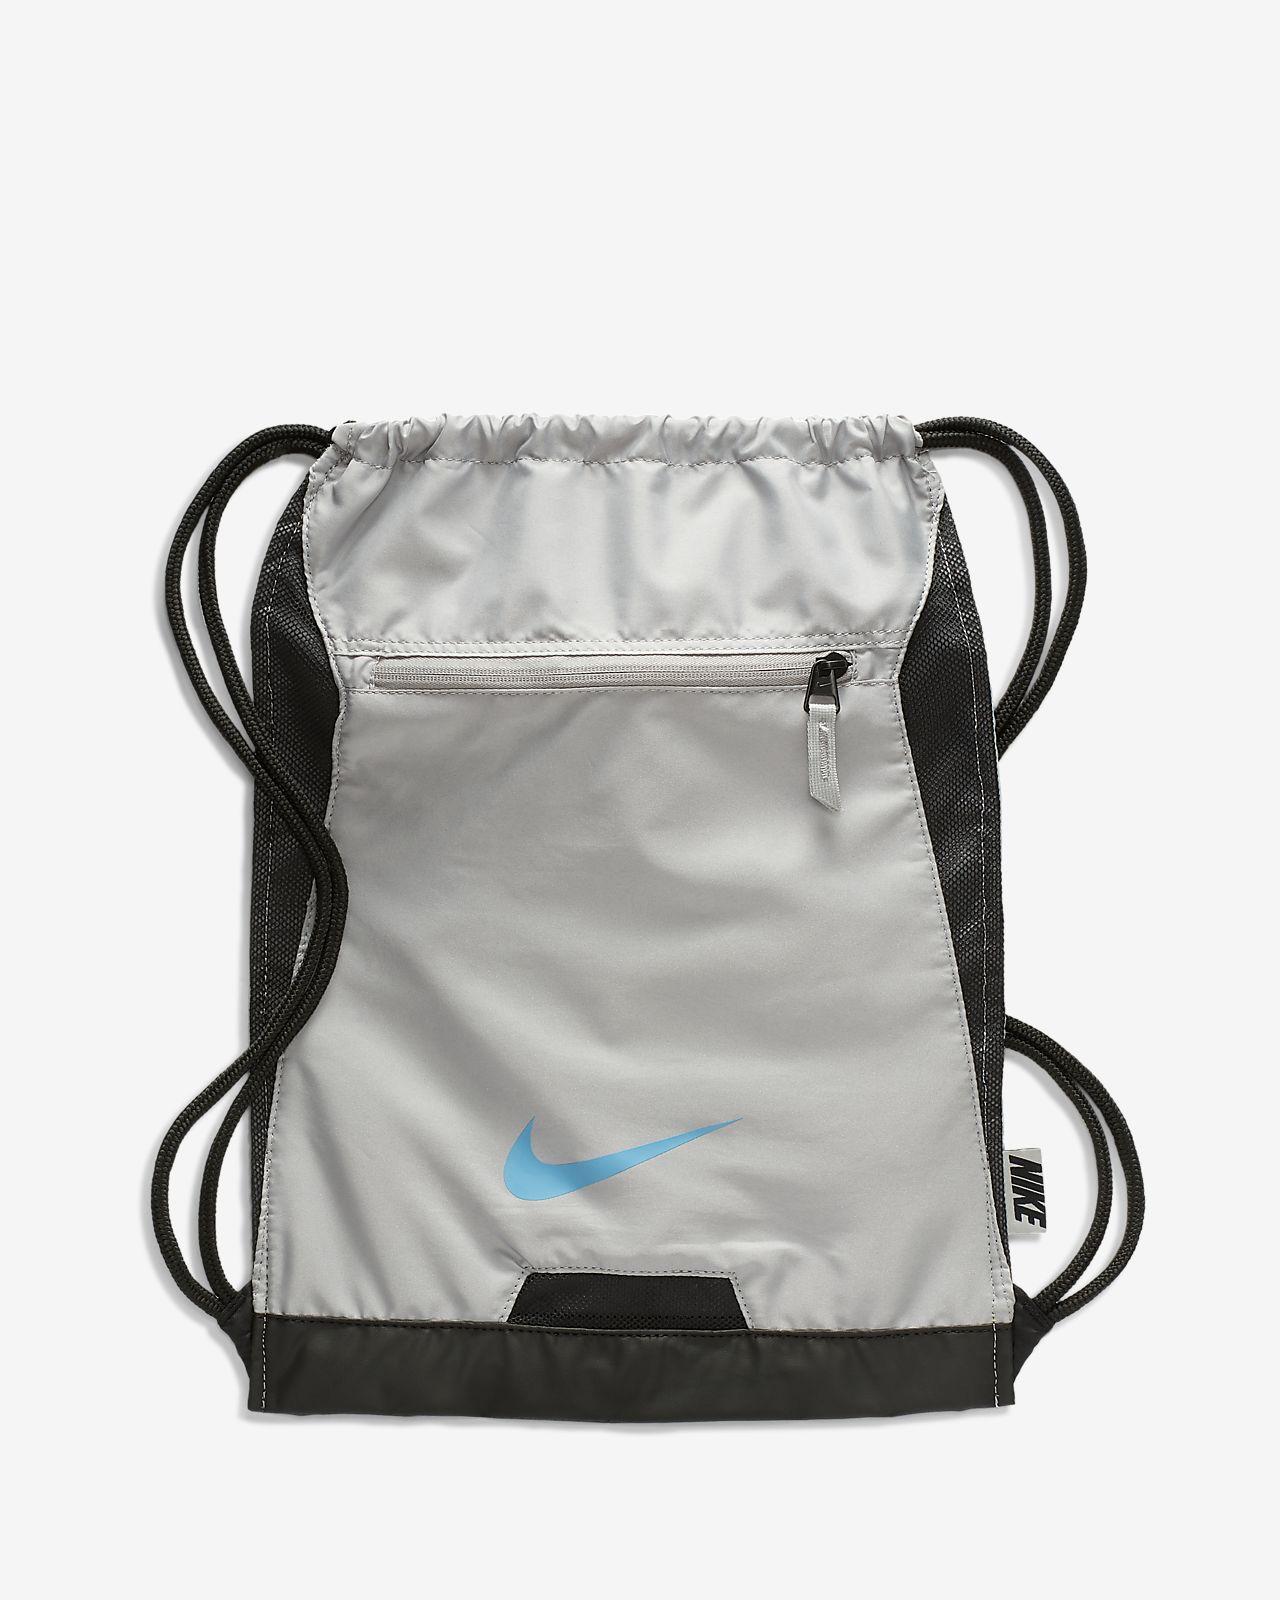 87f09c44c0 Nike Alpha Adapt Gym Sack. Nike.com